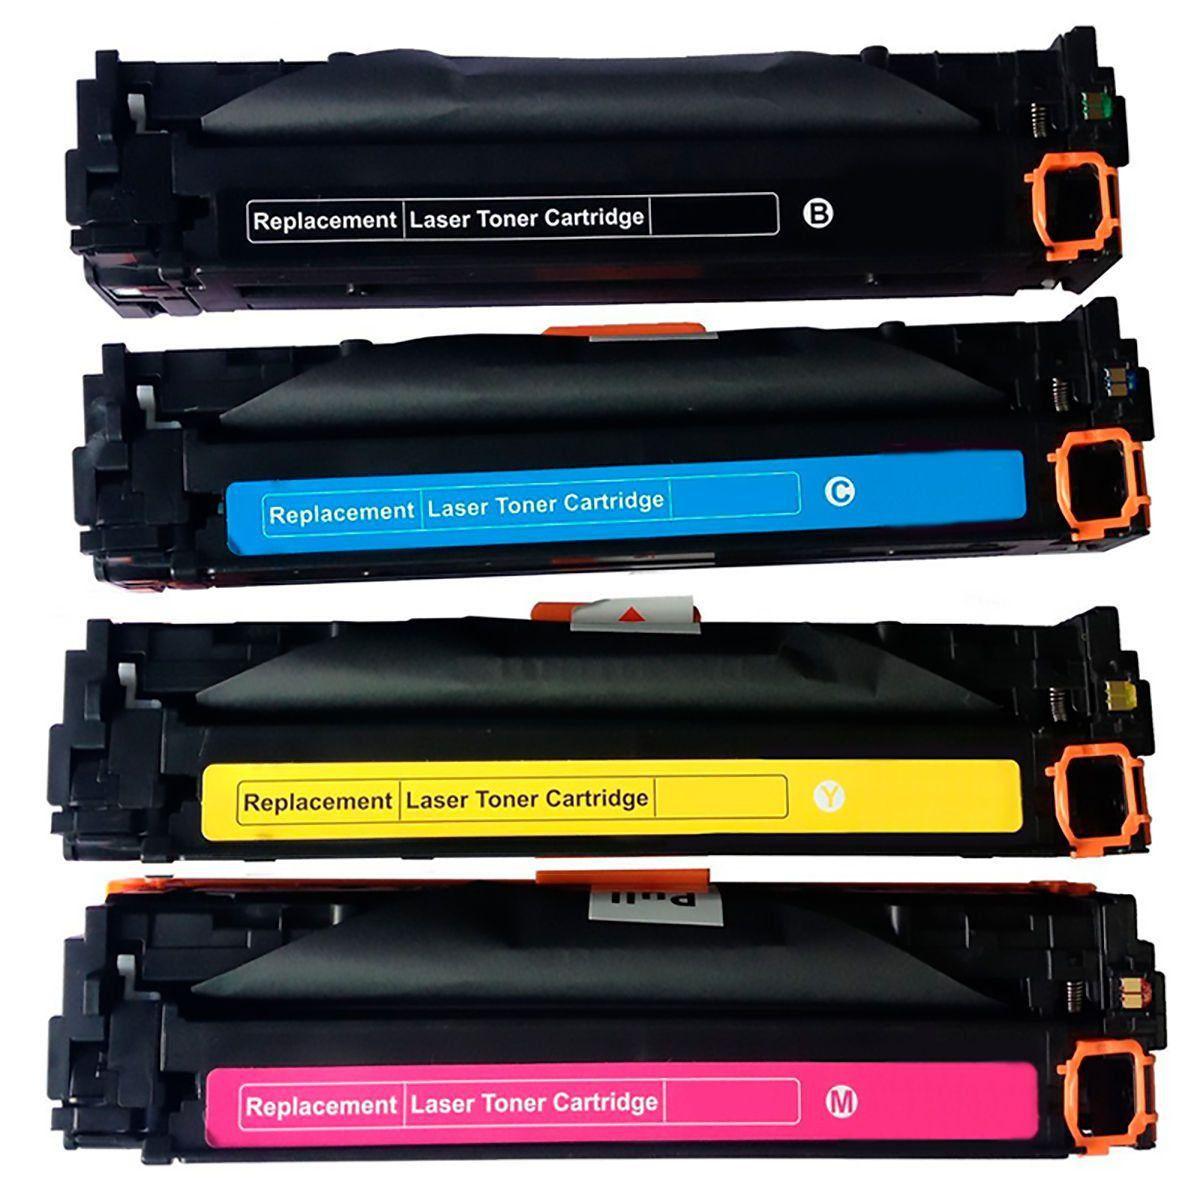 Compatível: Kit Colorido de Toner 304A 305A 312A para HP M476nw M475nw M451nw M375nw CP2020 CP2025 CM2320nf mfp CP-2025